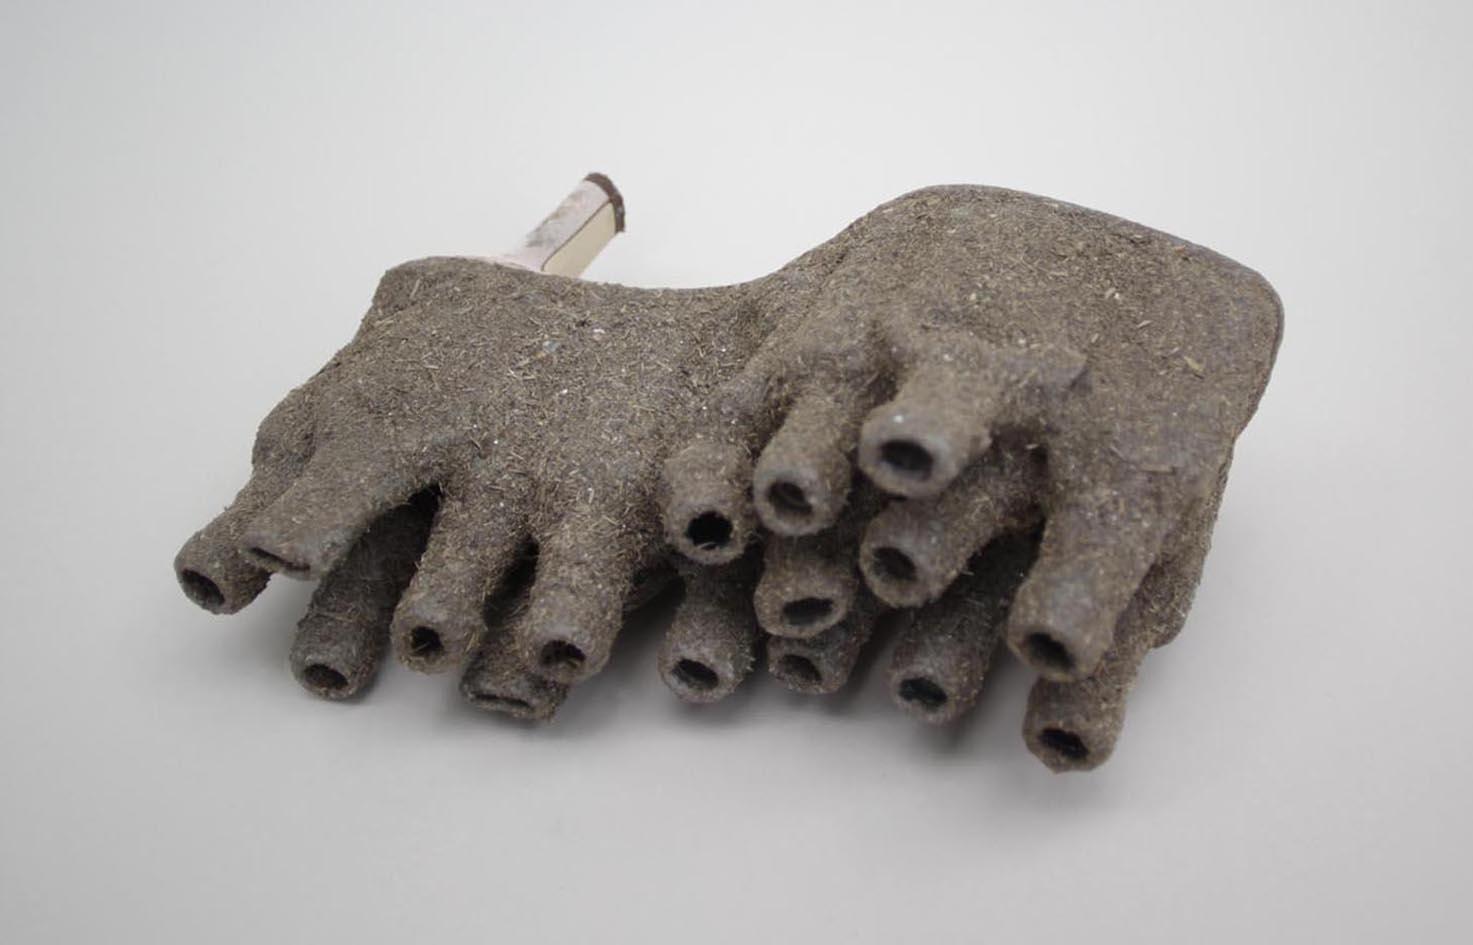 <b>sole II</b><br> found shoe, plastic bottles. feeds, glue 2014, 4 x 9 x 7 inches